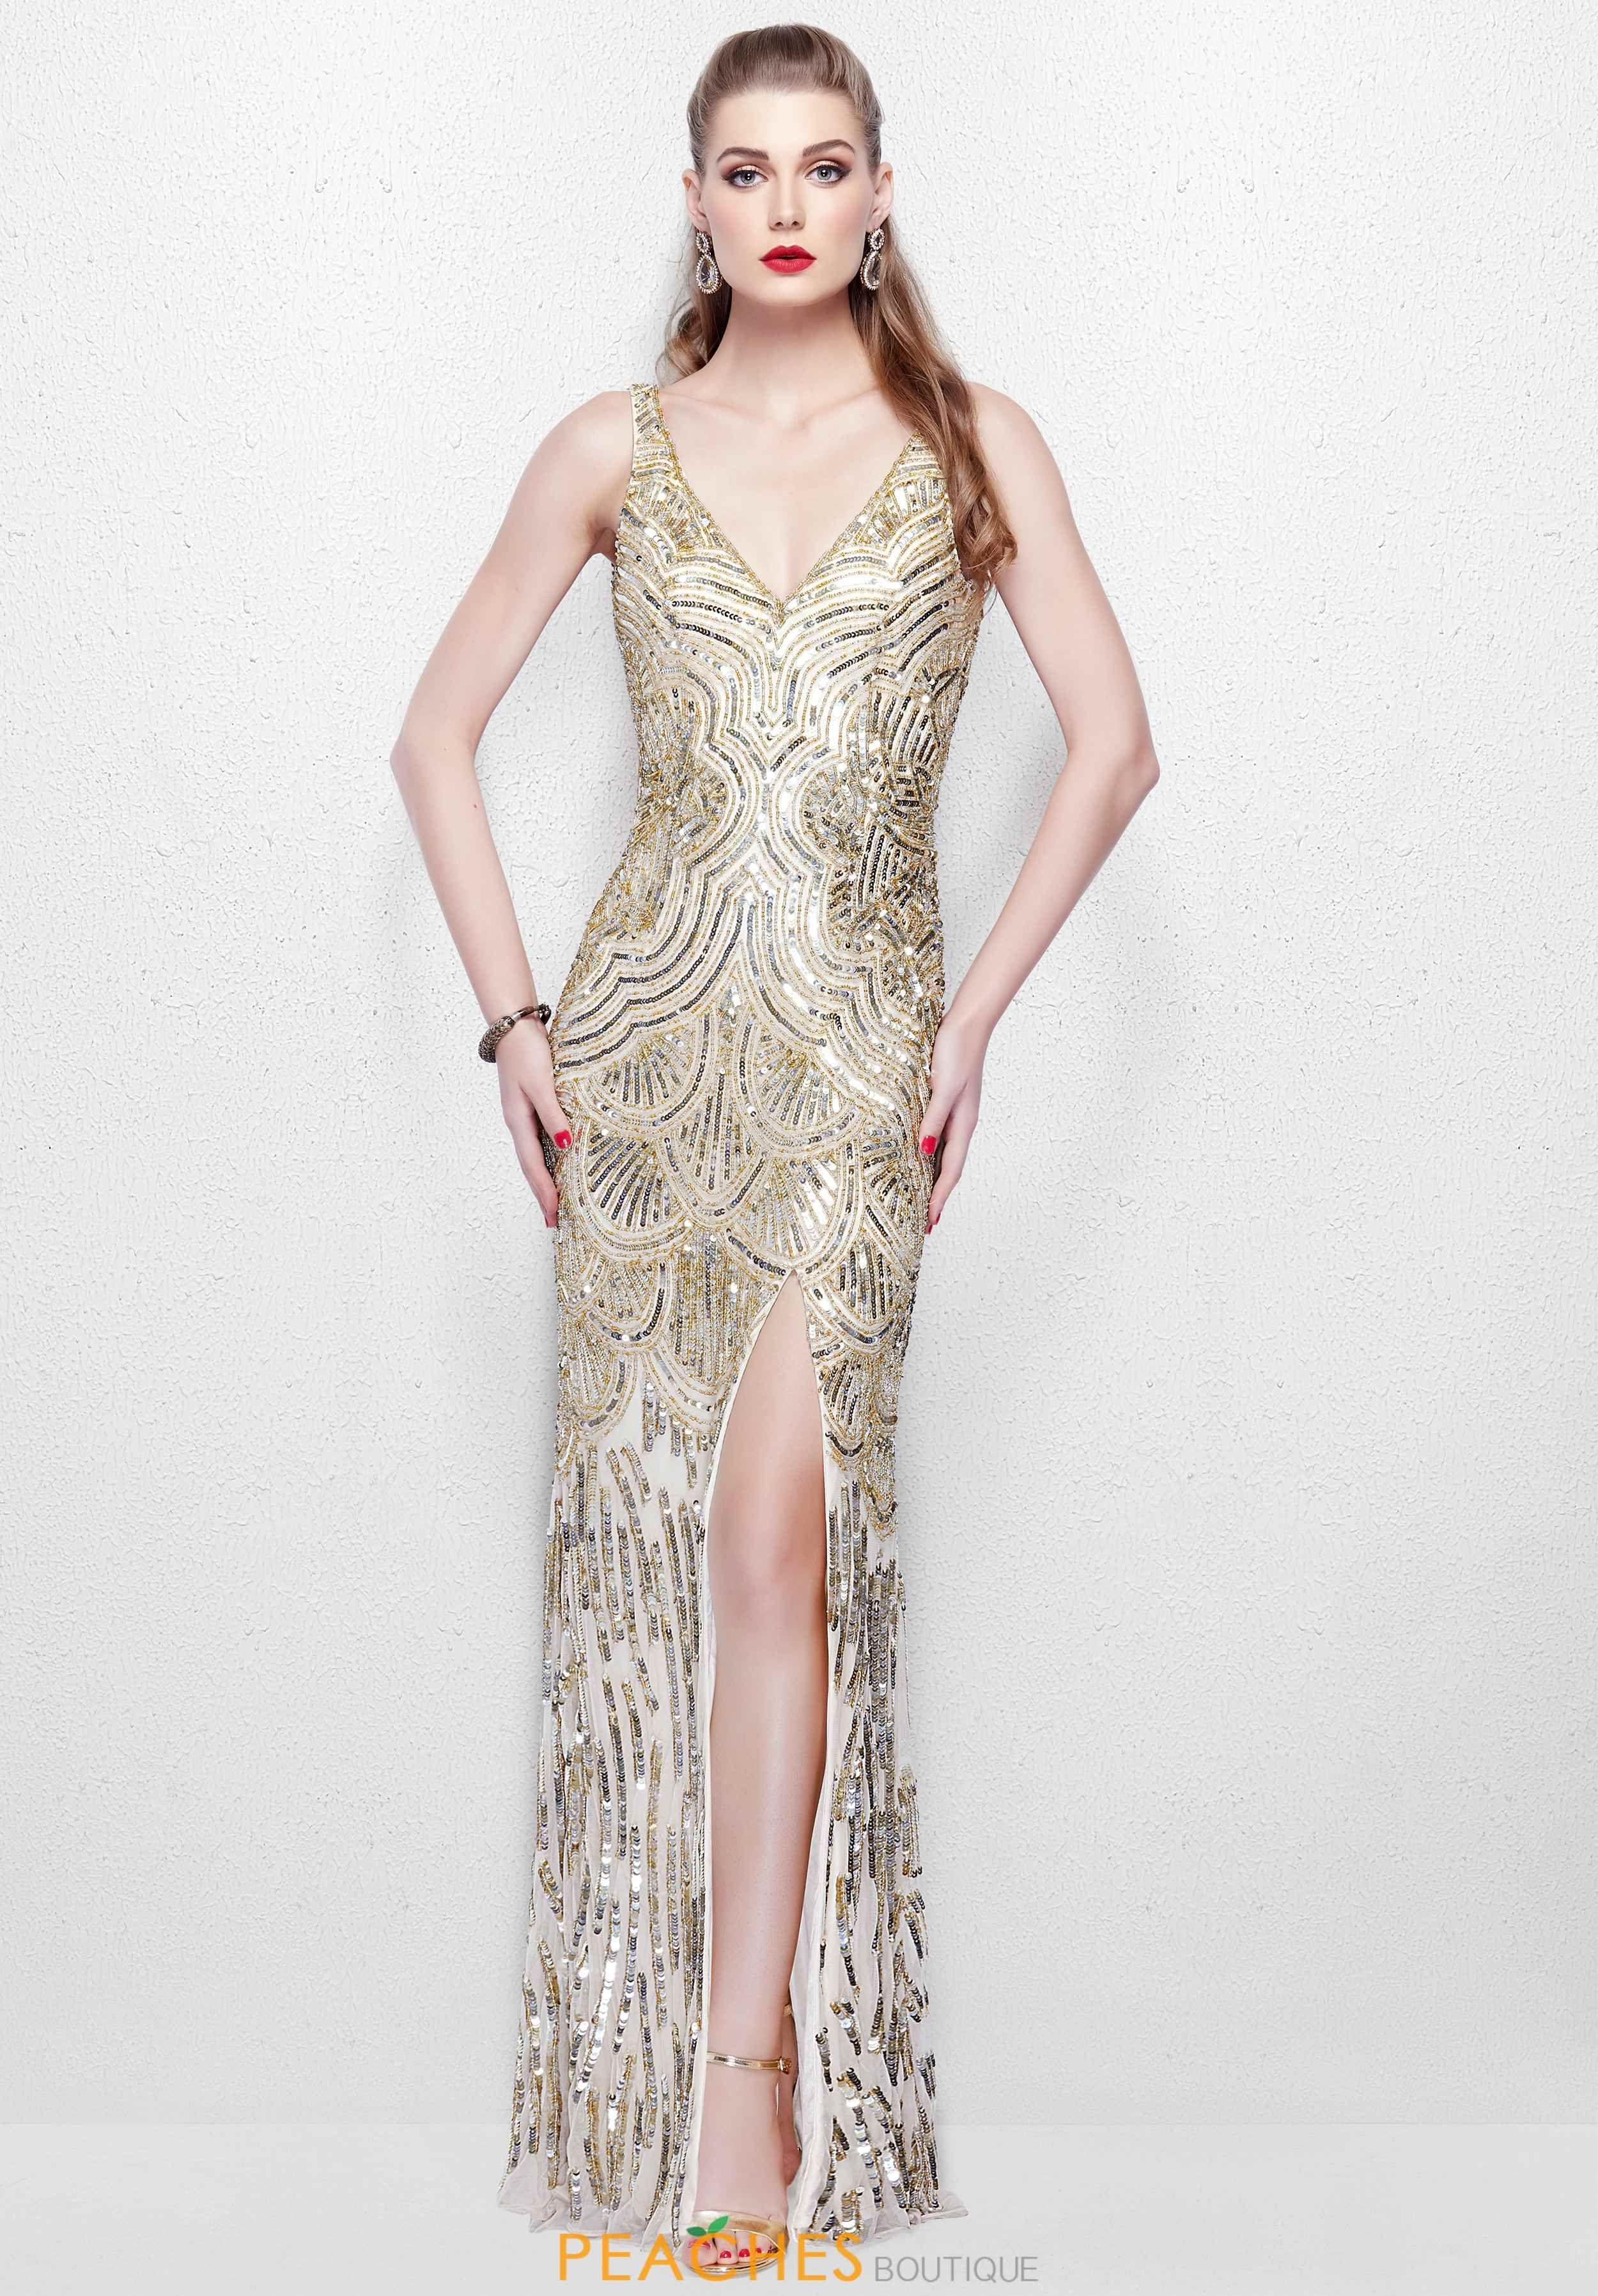 Fancy dresses long, Wedding dresses lace, Wedding dresses